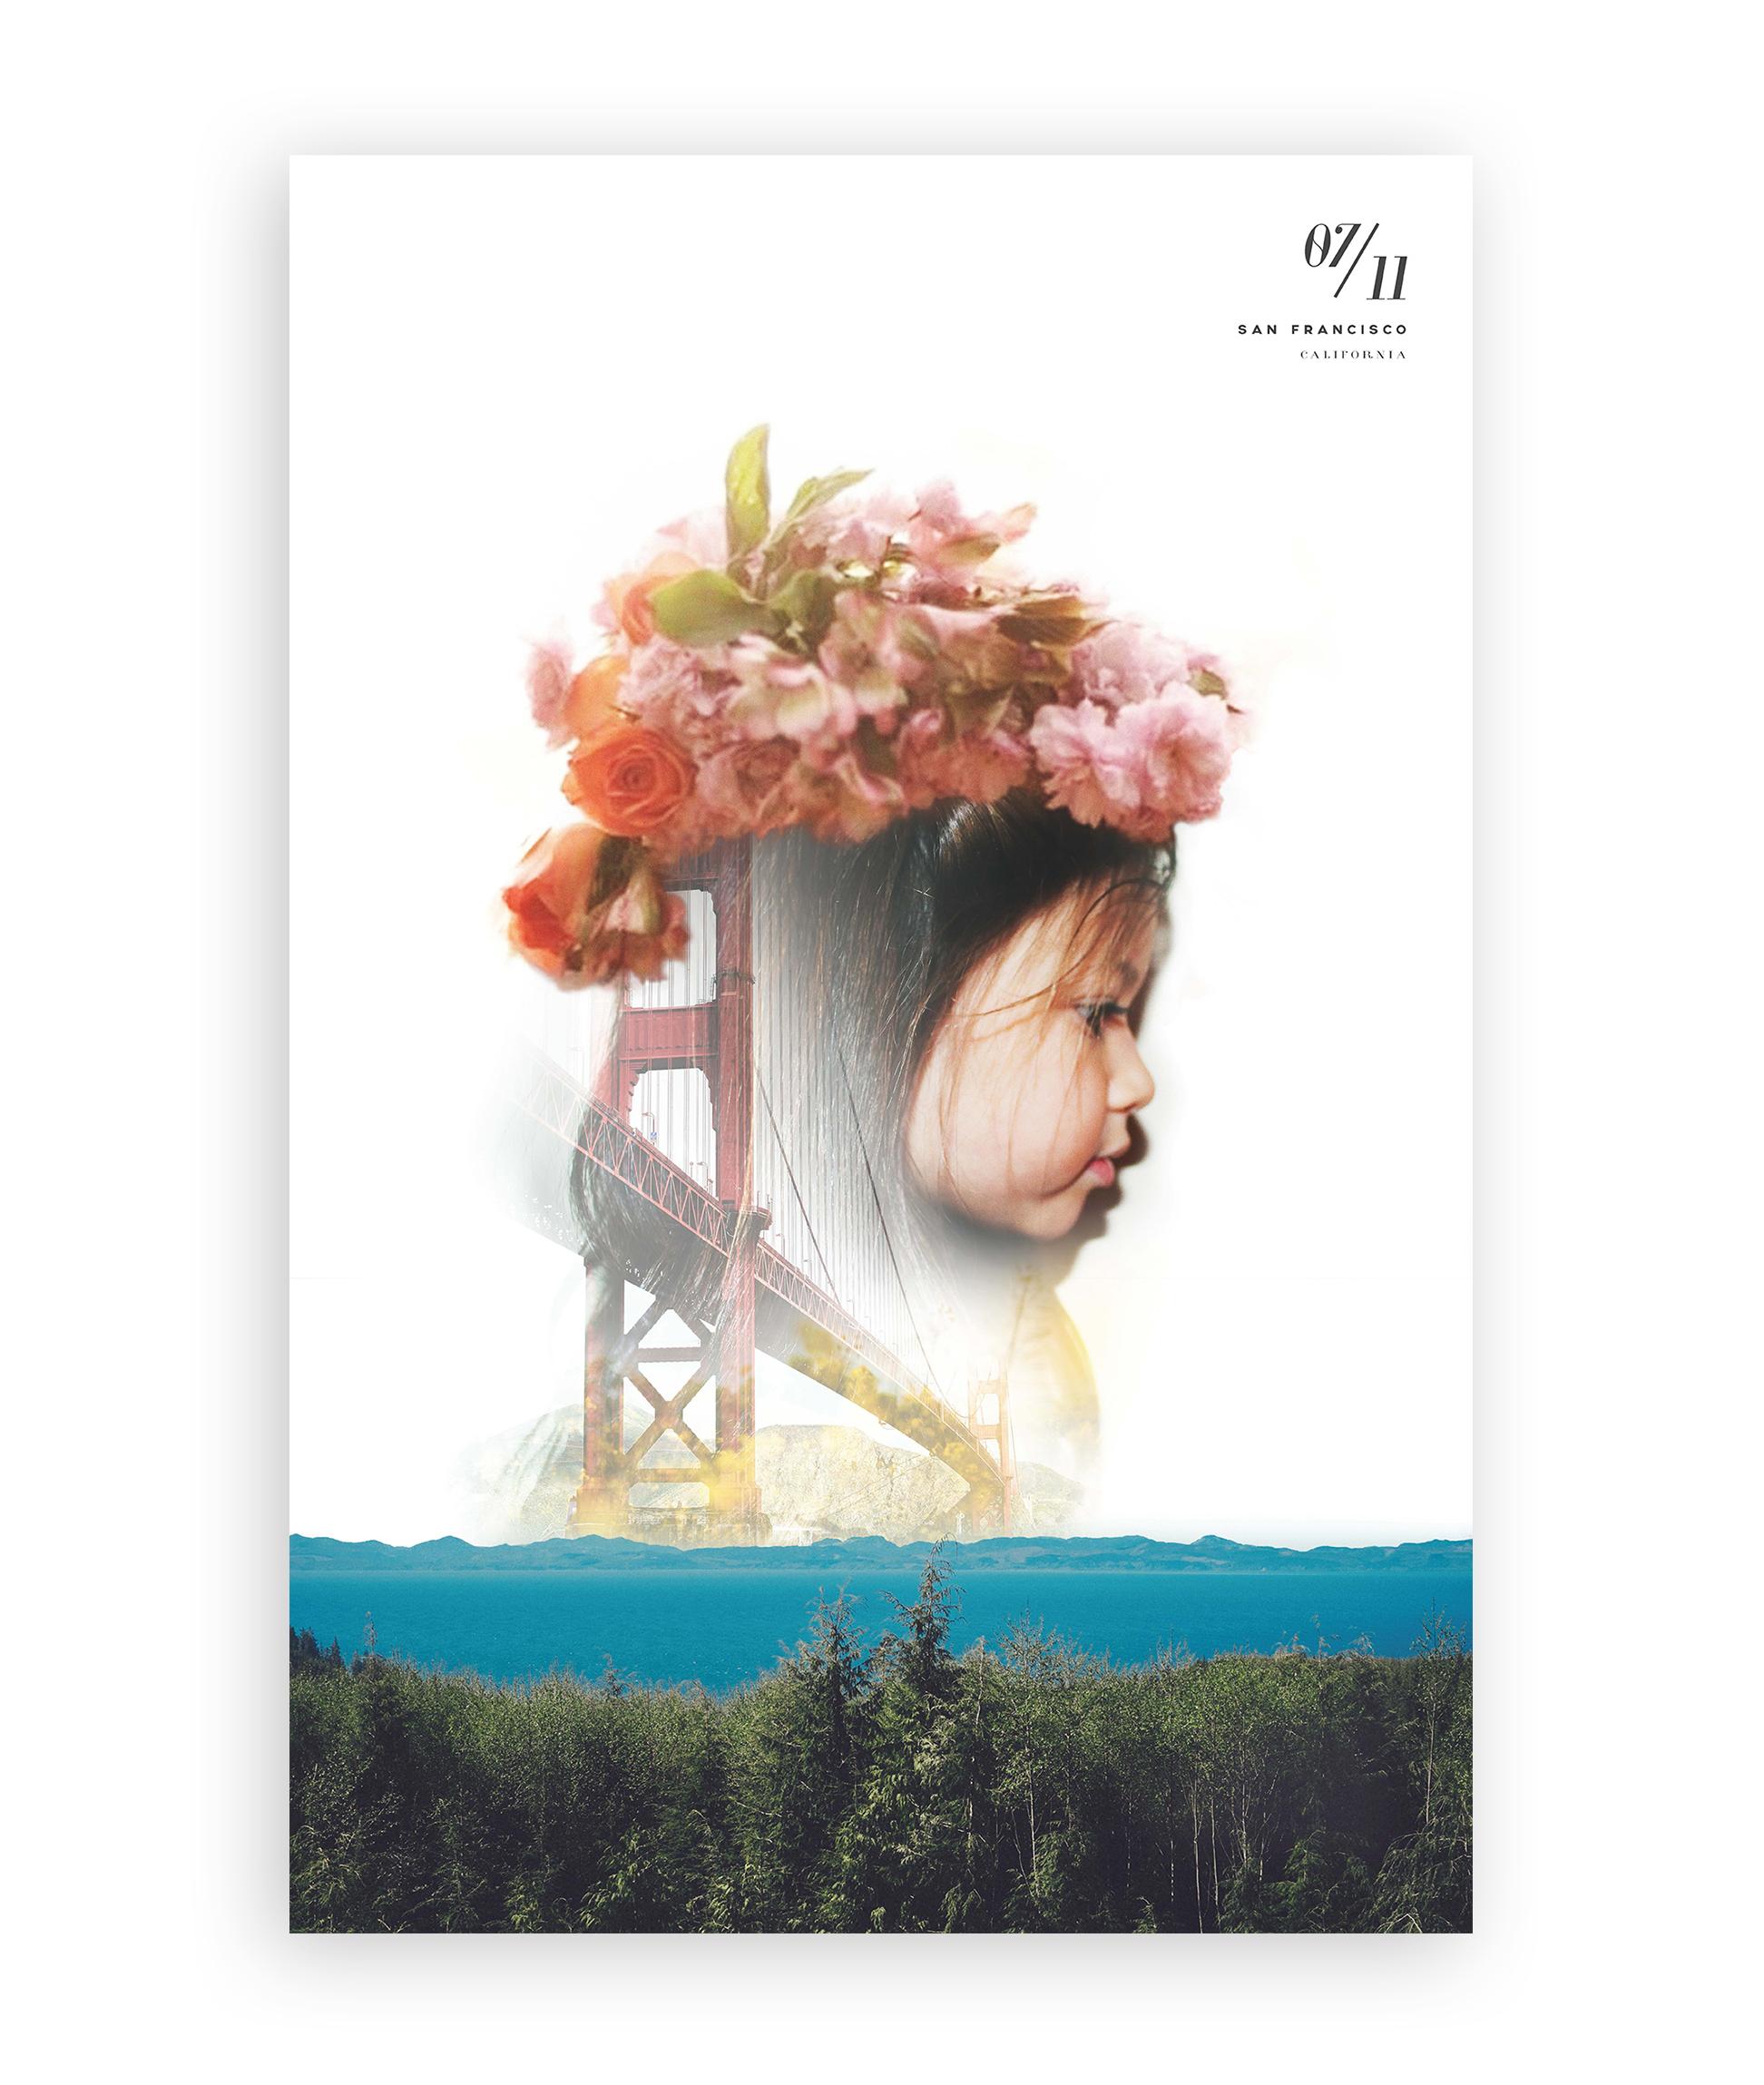 Designerly: Poster